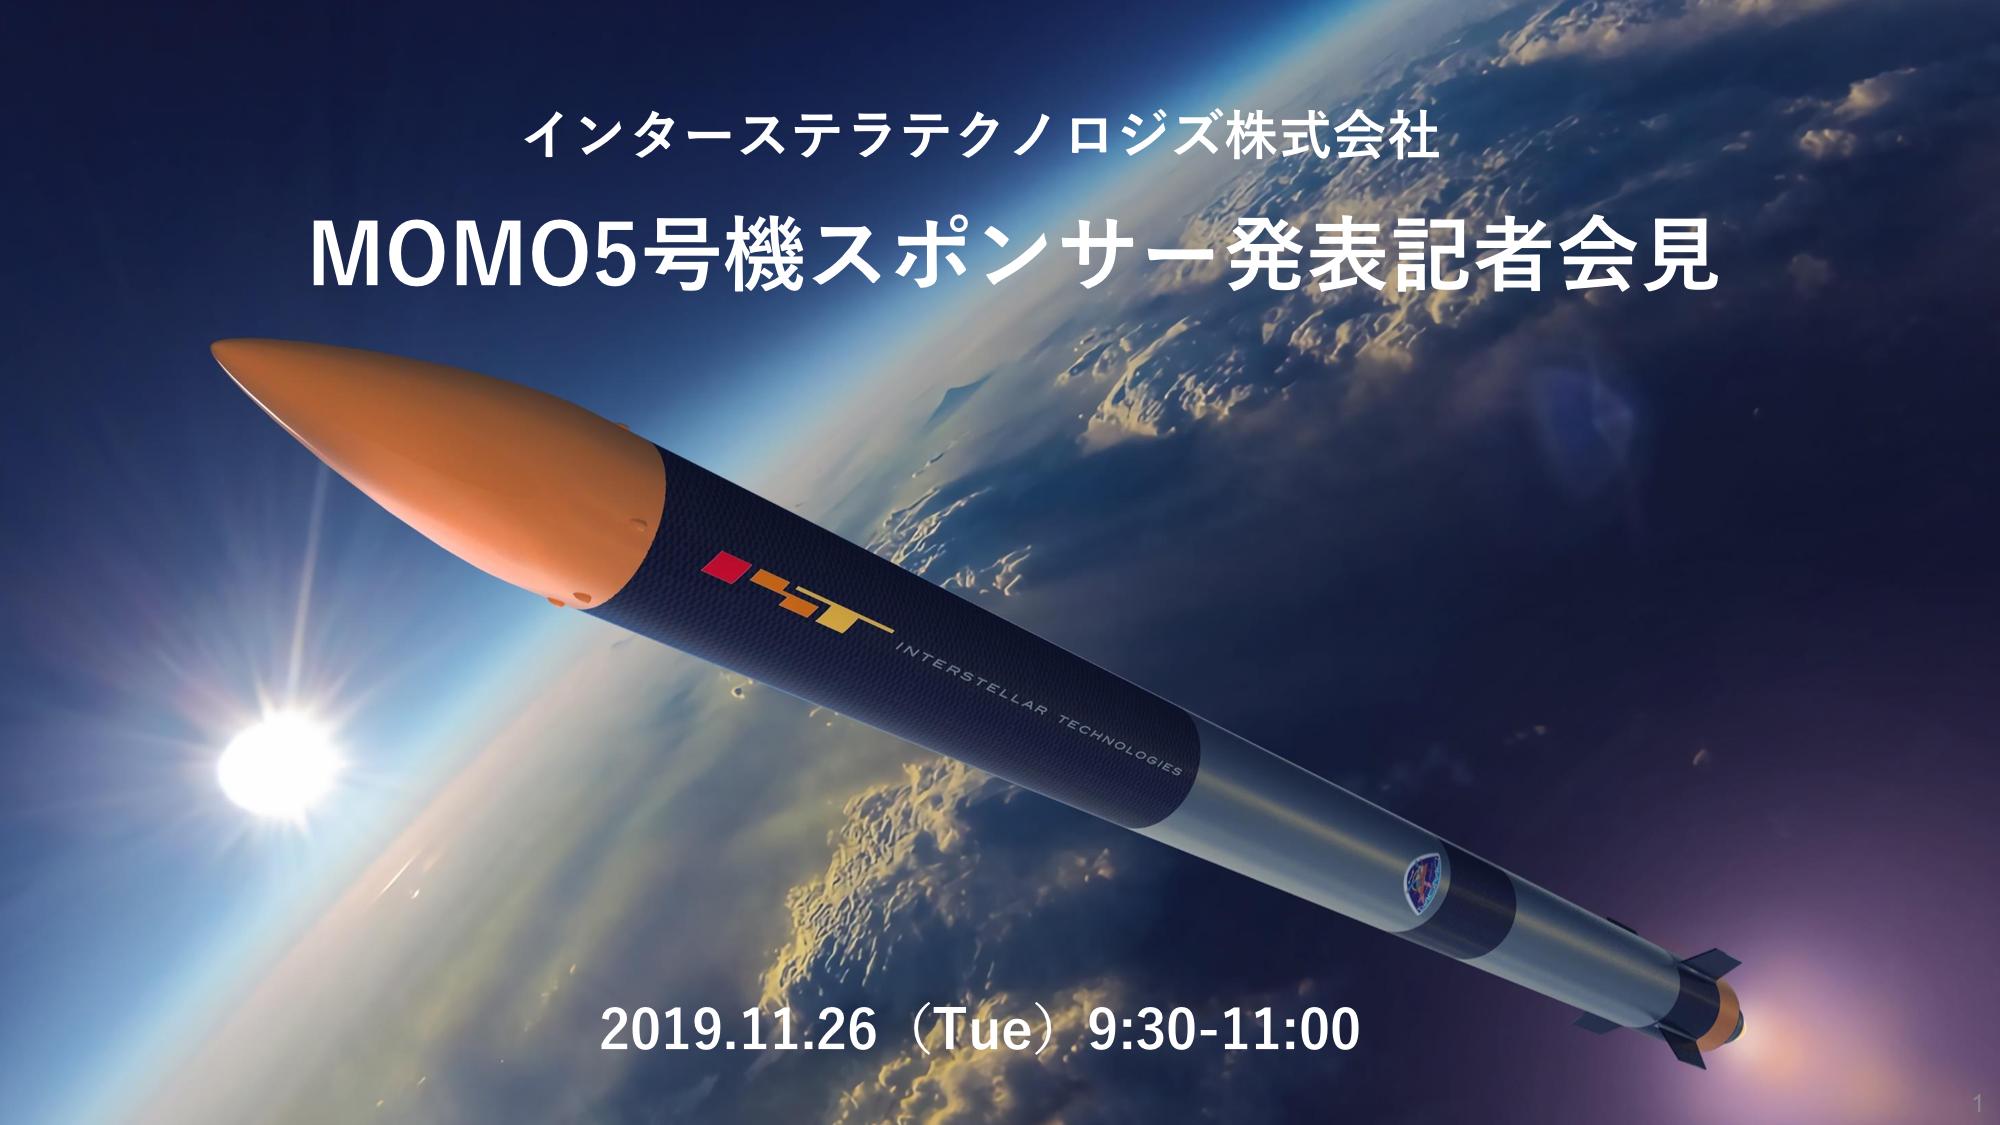 f:id:Imamura:20191126134949p:plain